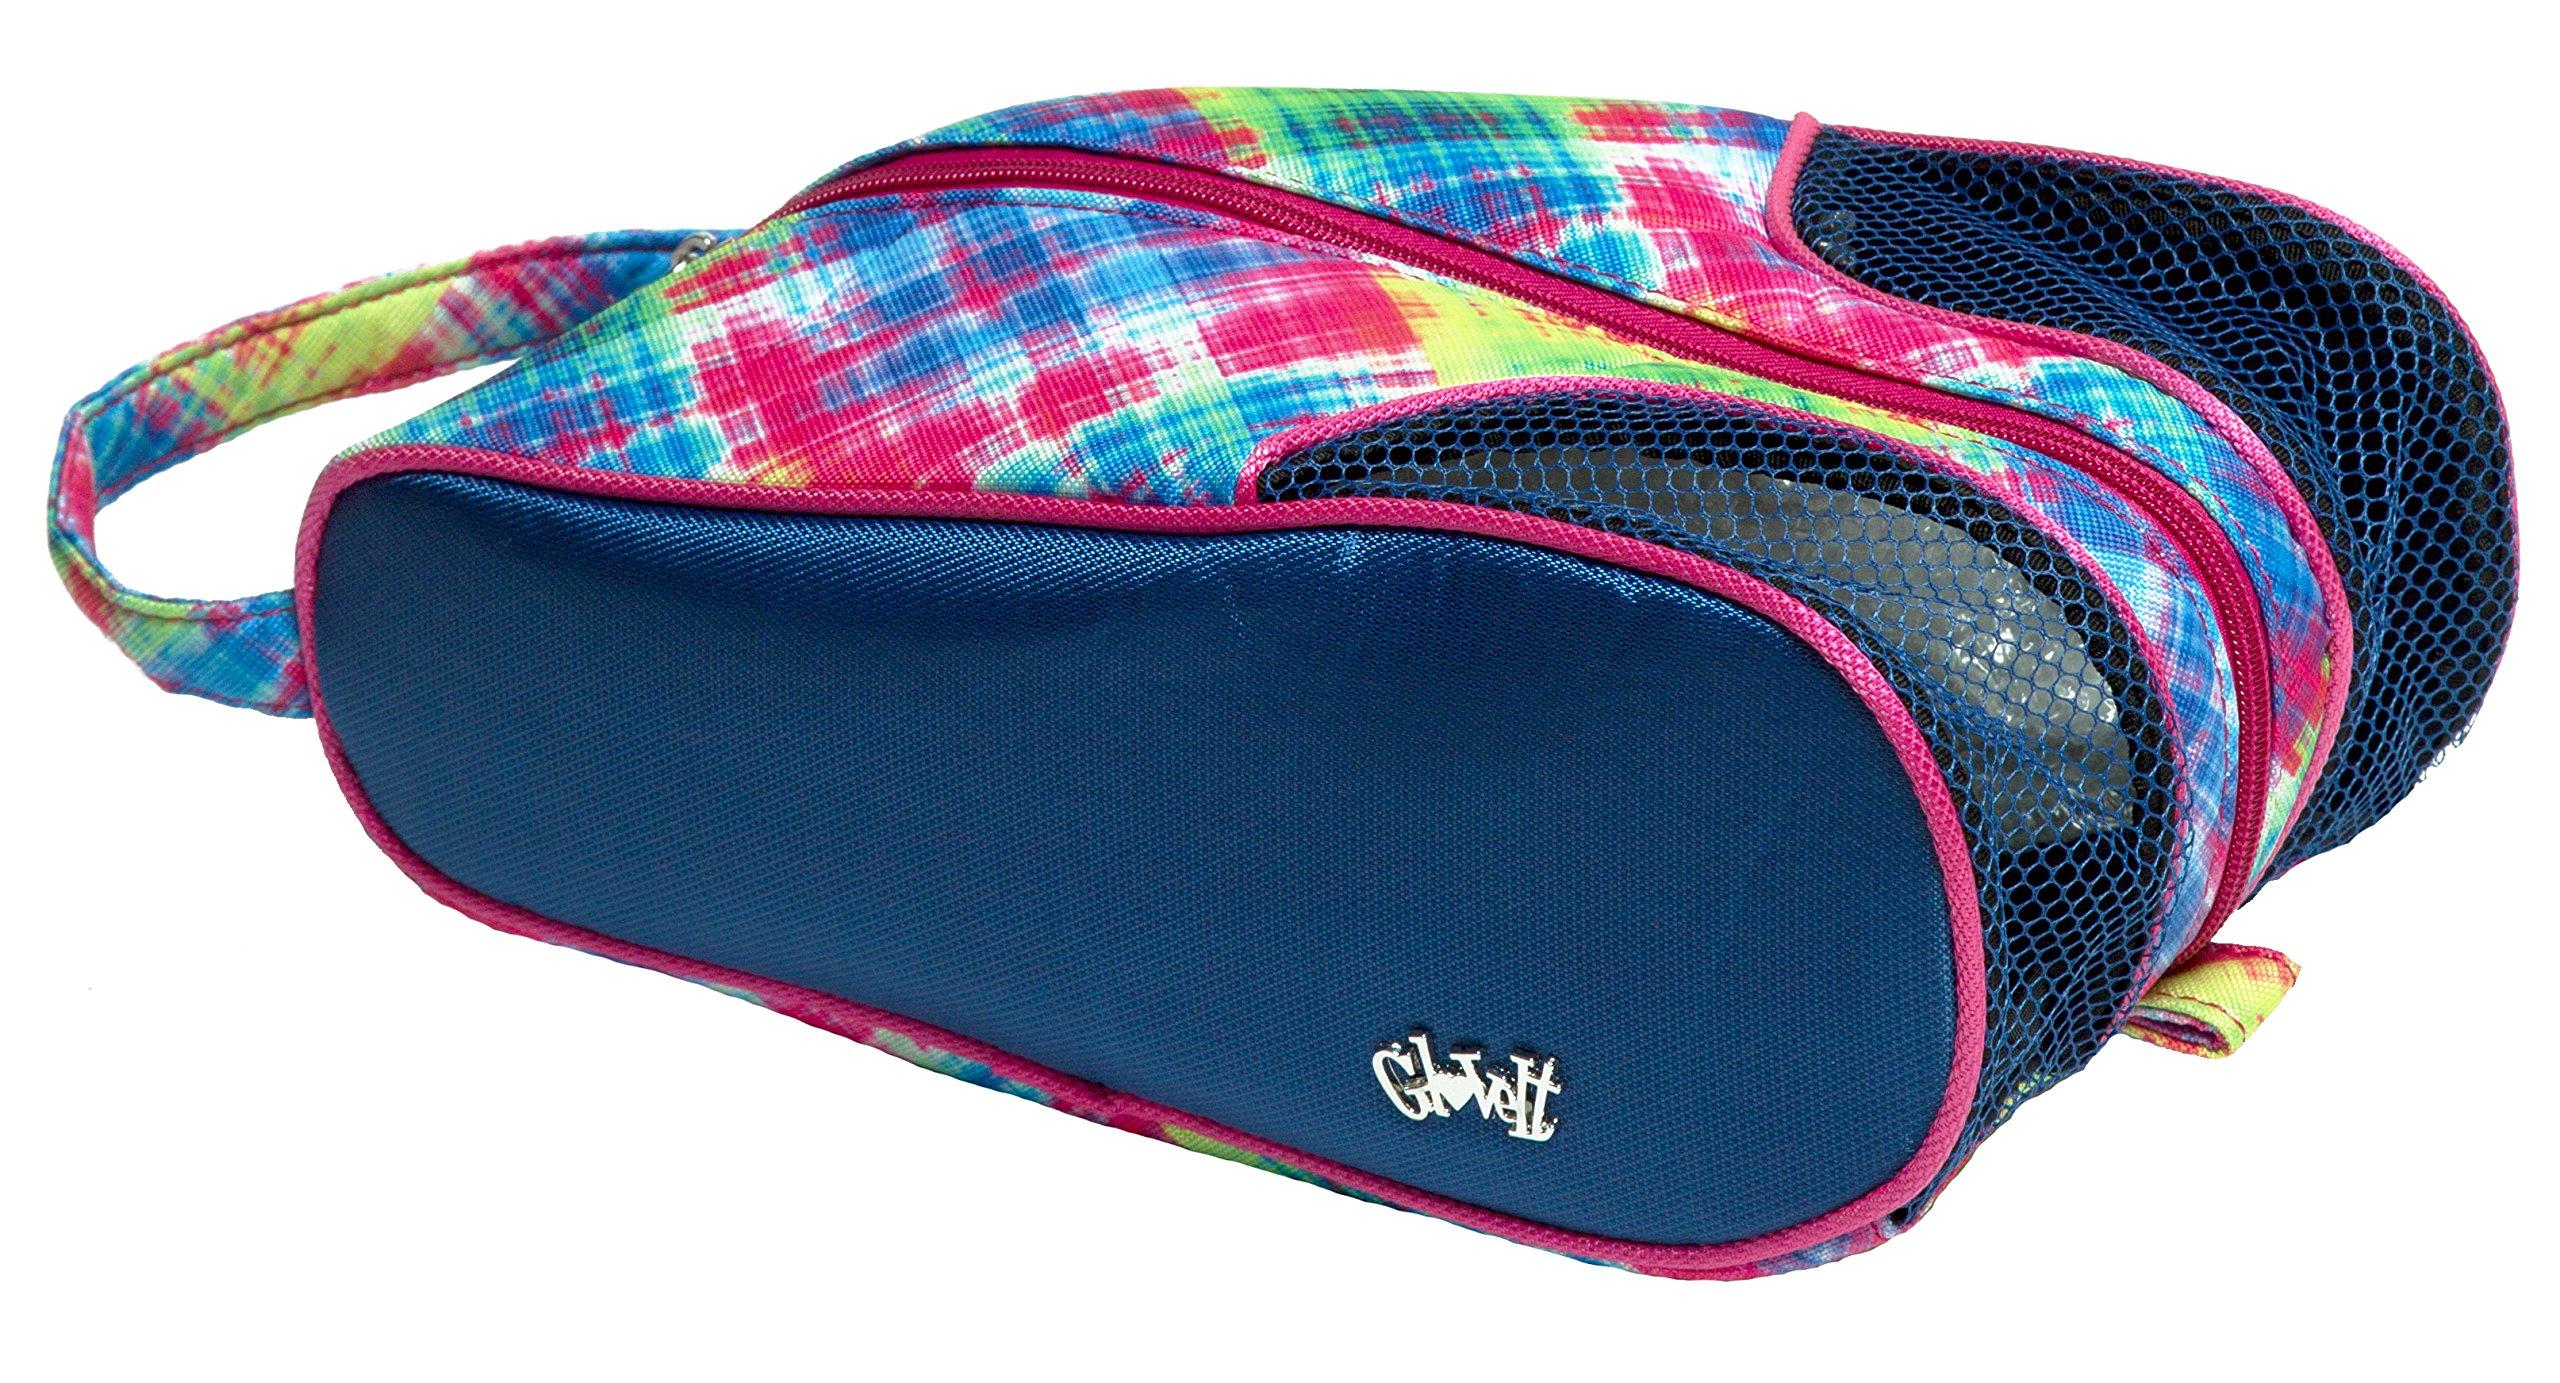 Glove It Women's Electirc Plaid Shoe Bag SB227 by Glove It